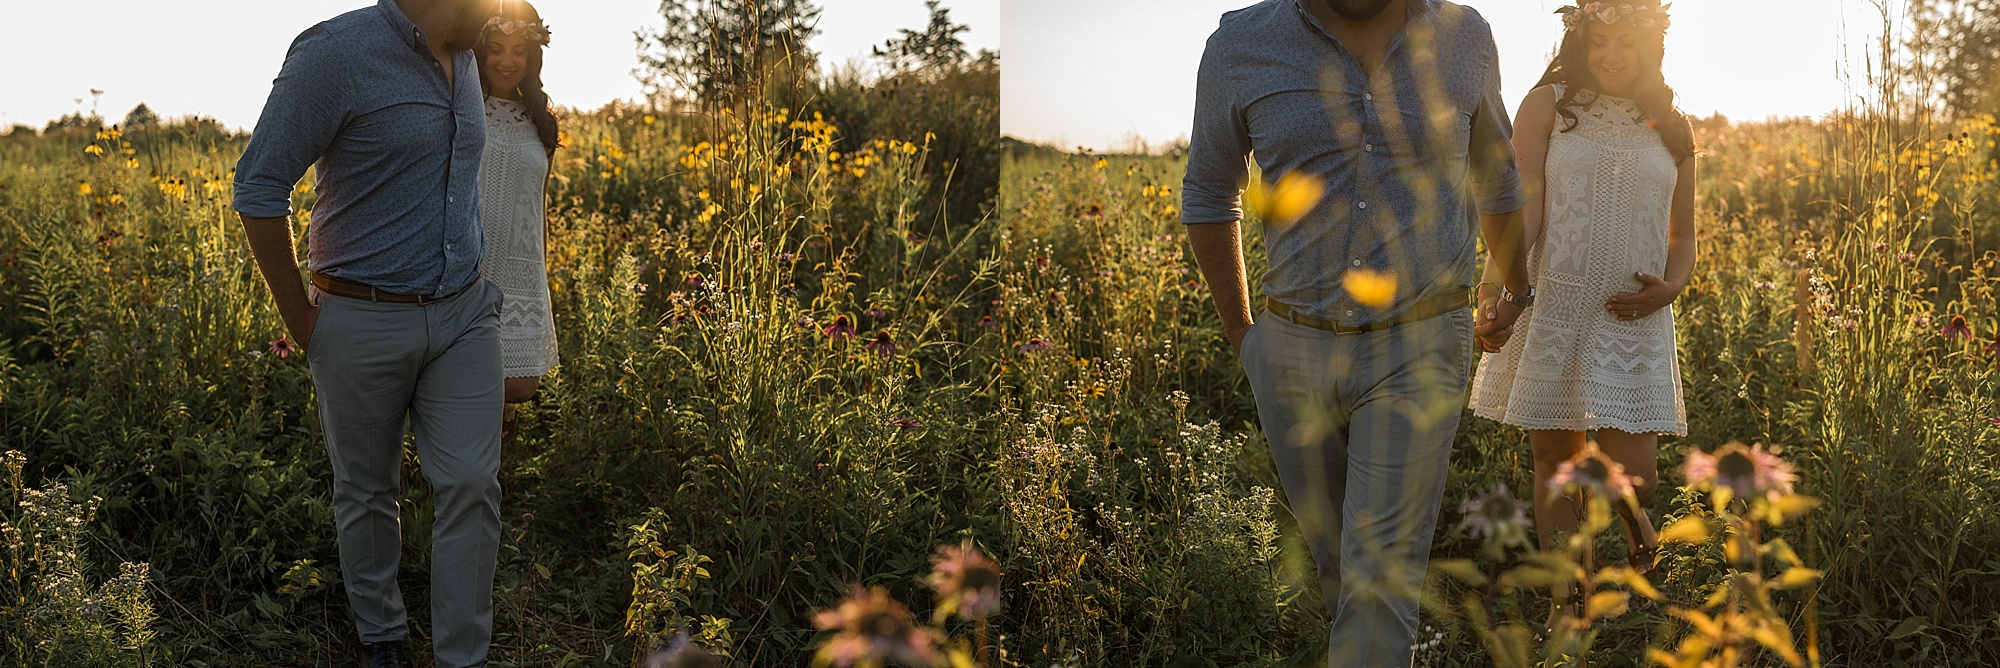 lauren-grayson-photography-cleveland-ohio-photographer-maternity-summer-outdoor-bohemian-fields-session_0482.jpg